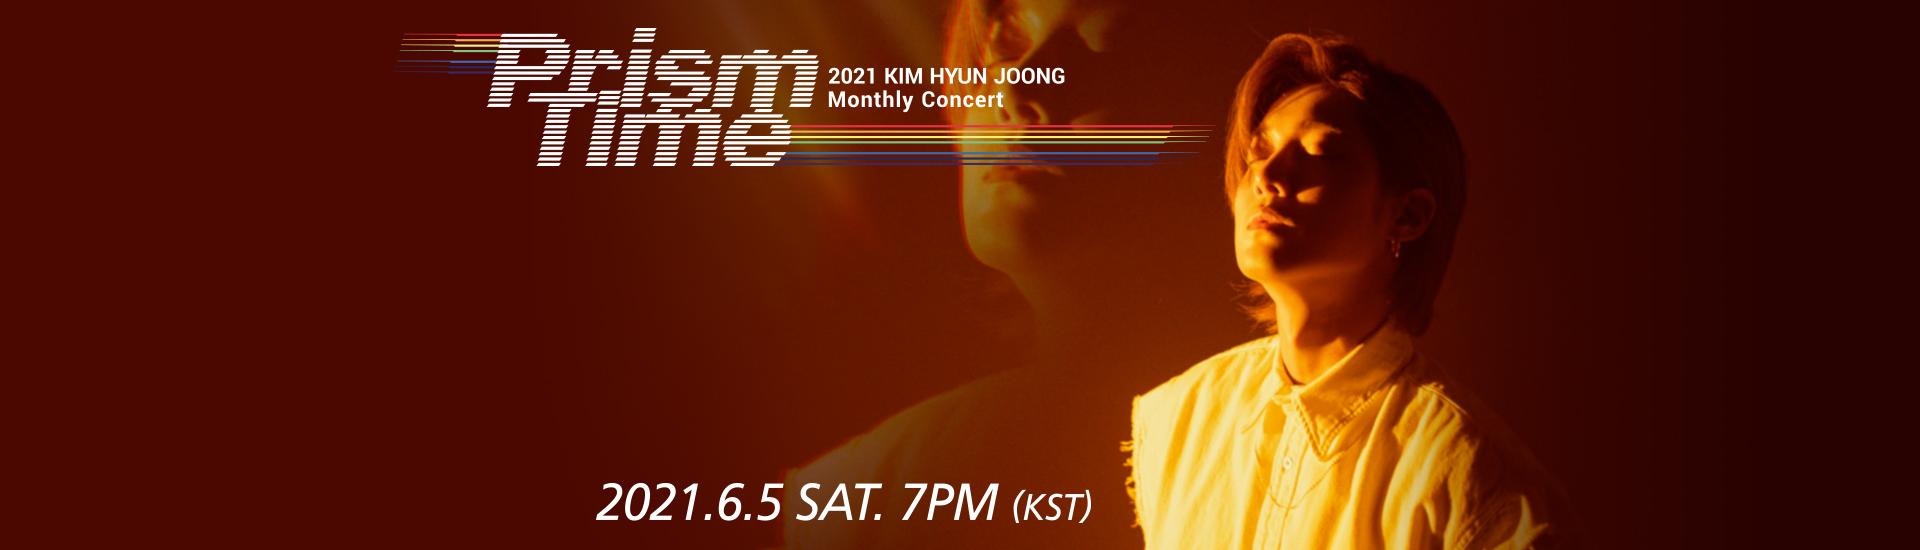 Kim Hyun Joong - KIM HYUN JOONG Monthly Concert 'Prism Time' [Orange Hug]